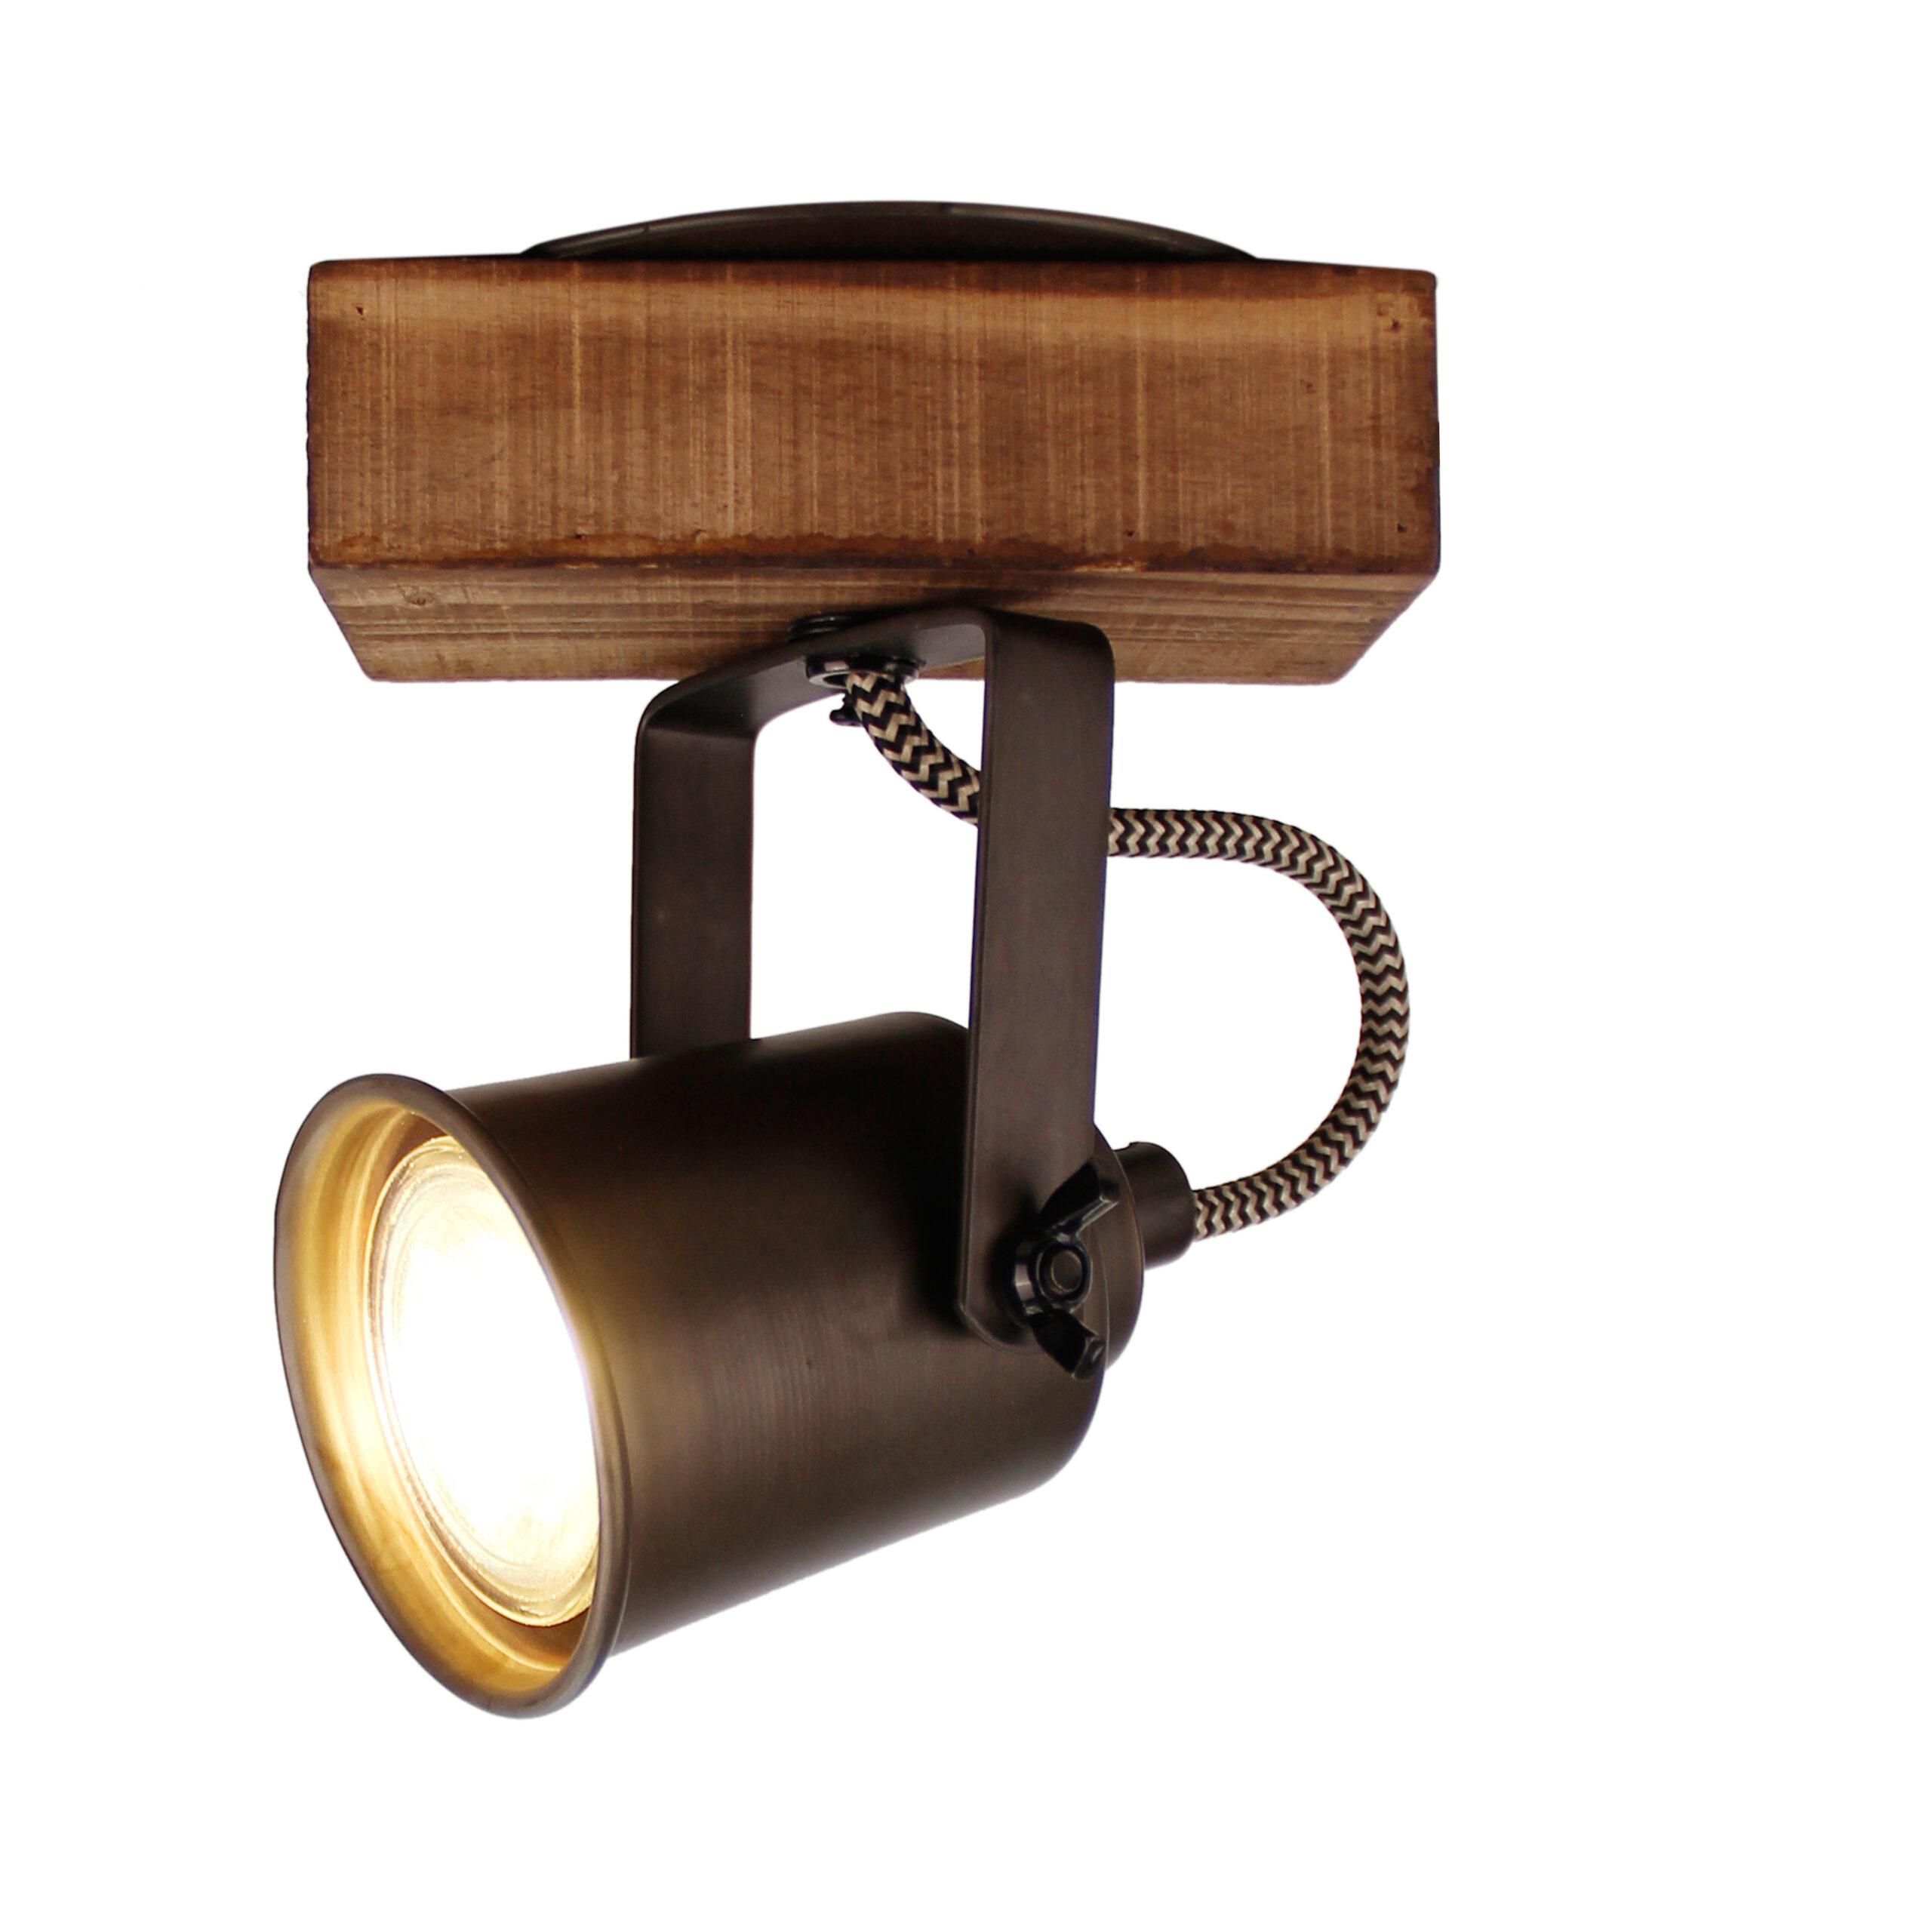 Tazza spot - 1 lichts - zwart black steel met vintage hout